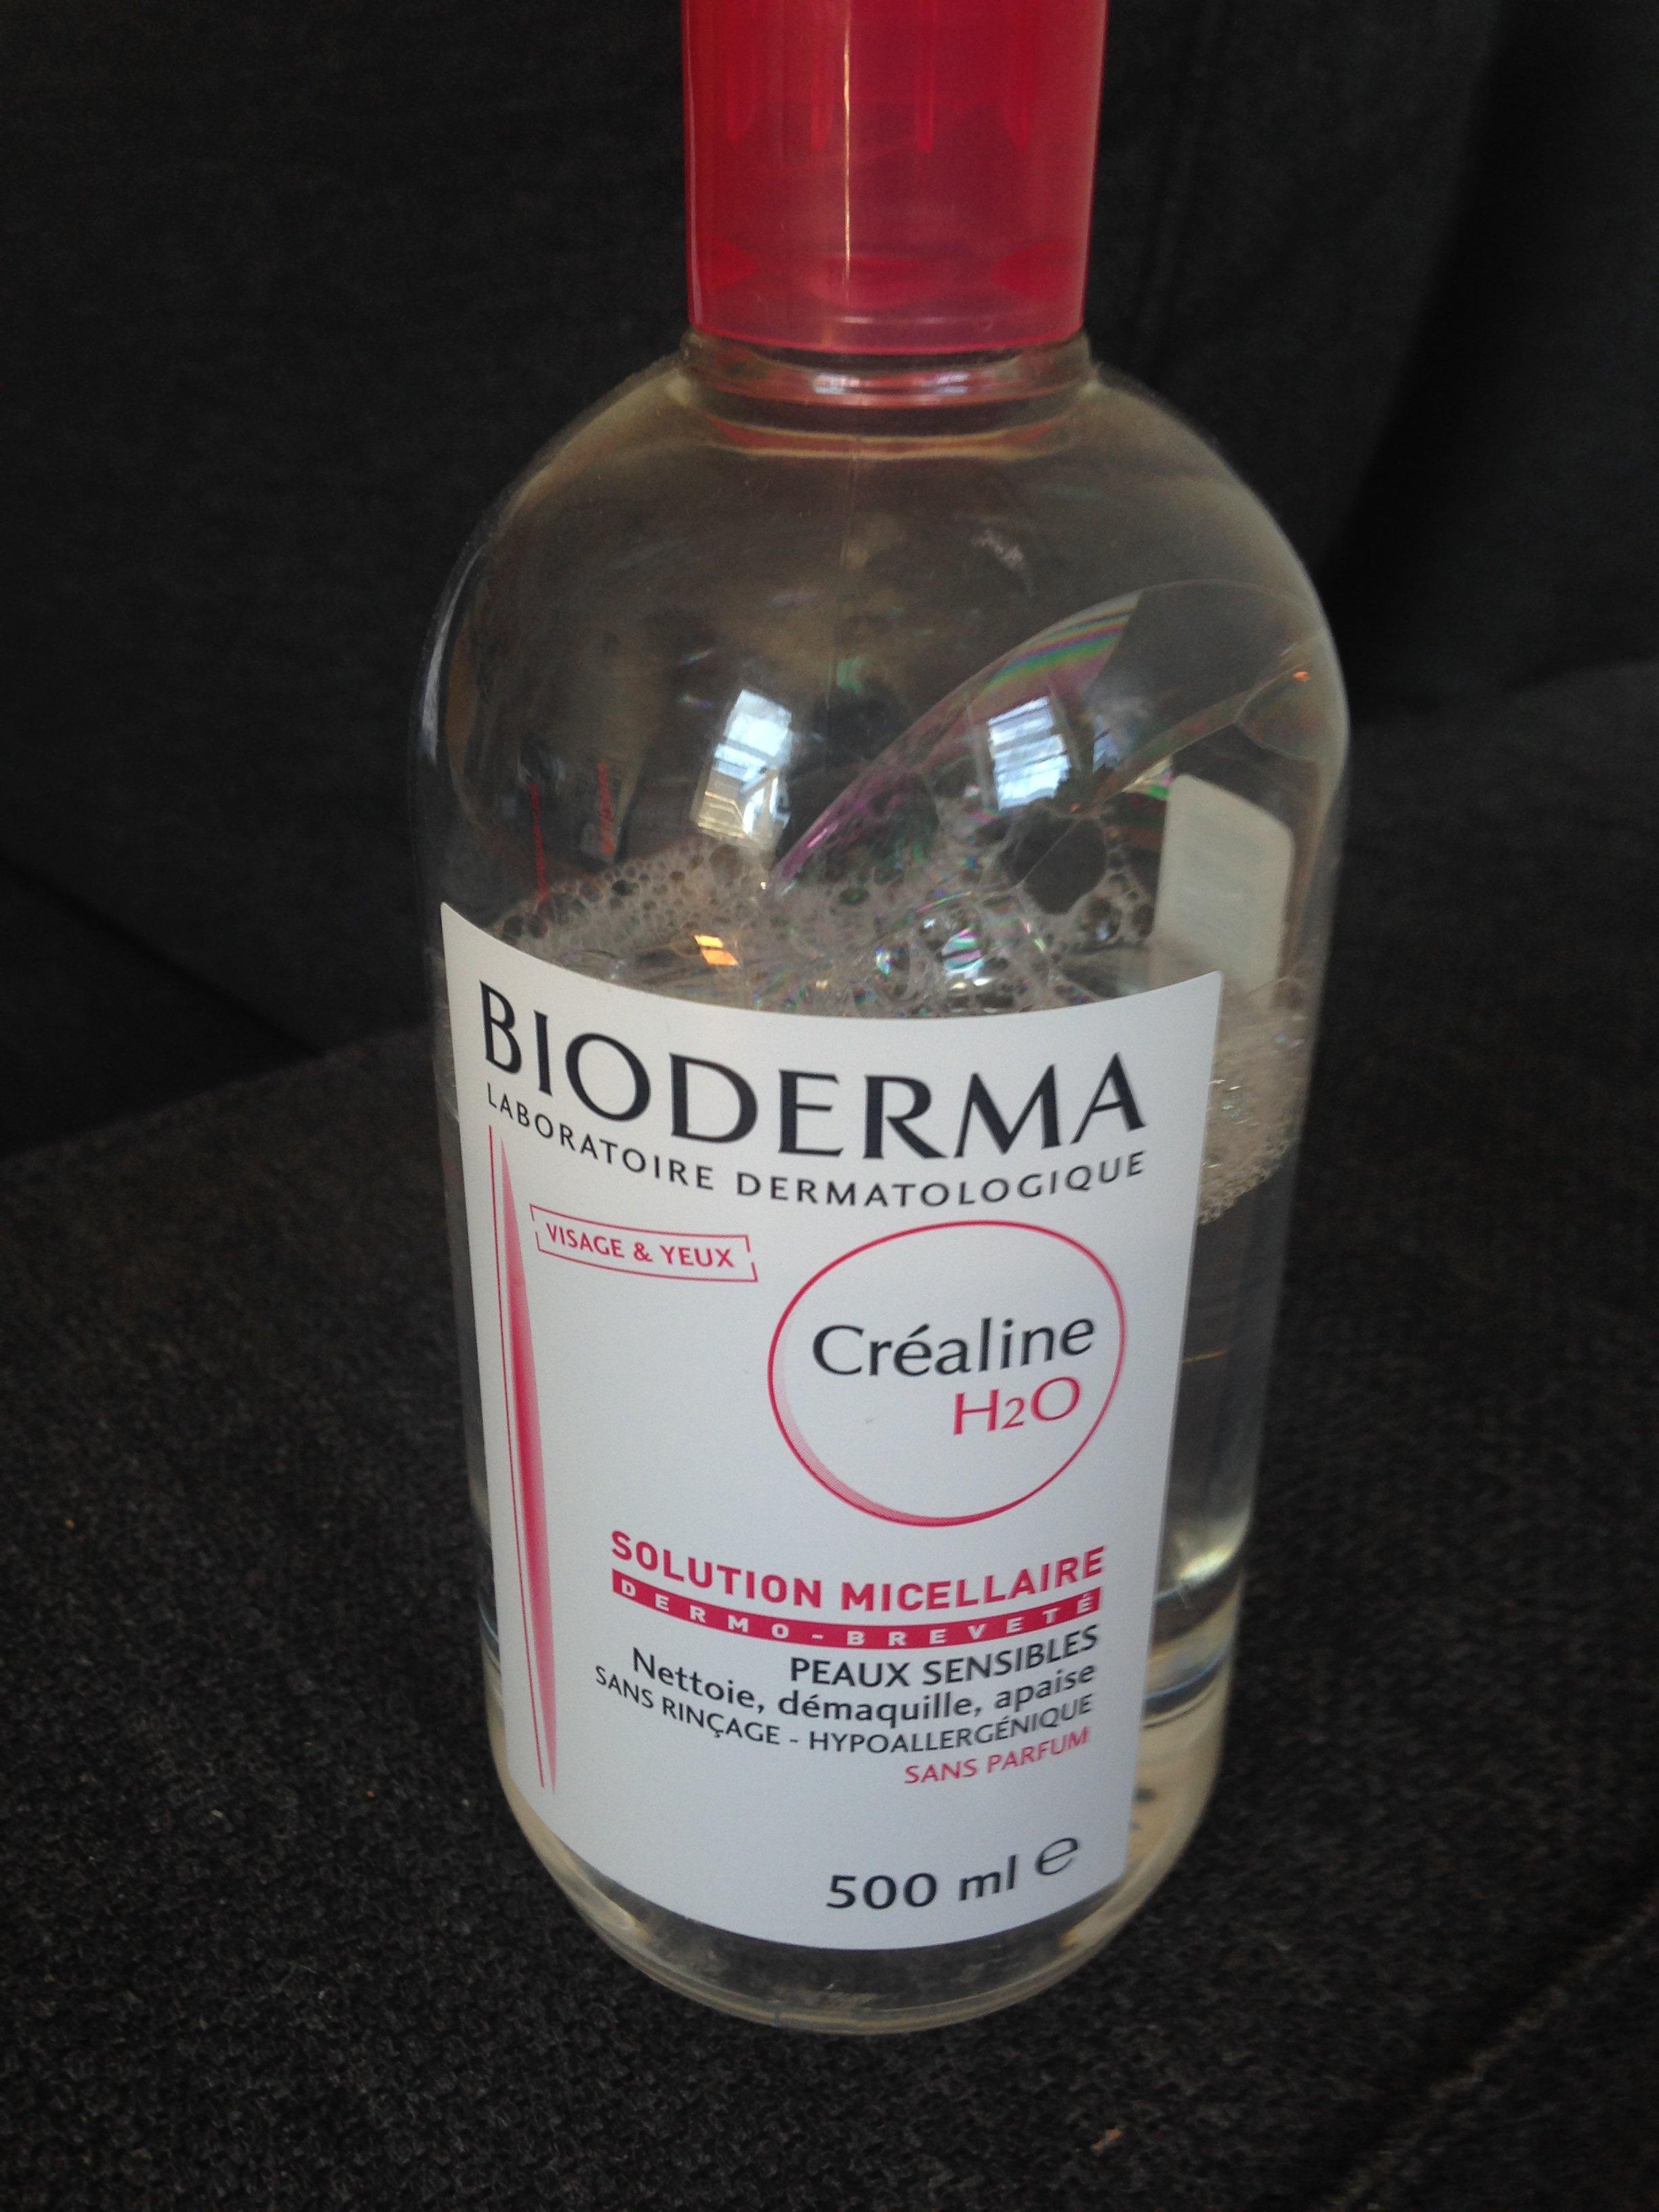 Créaline T.S. H2O de Bioderma [Deleted]